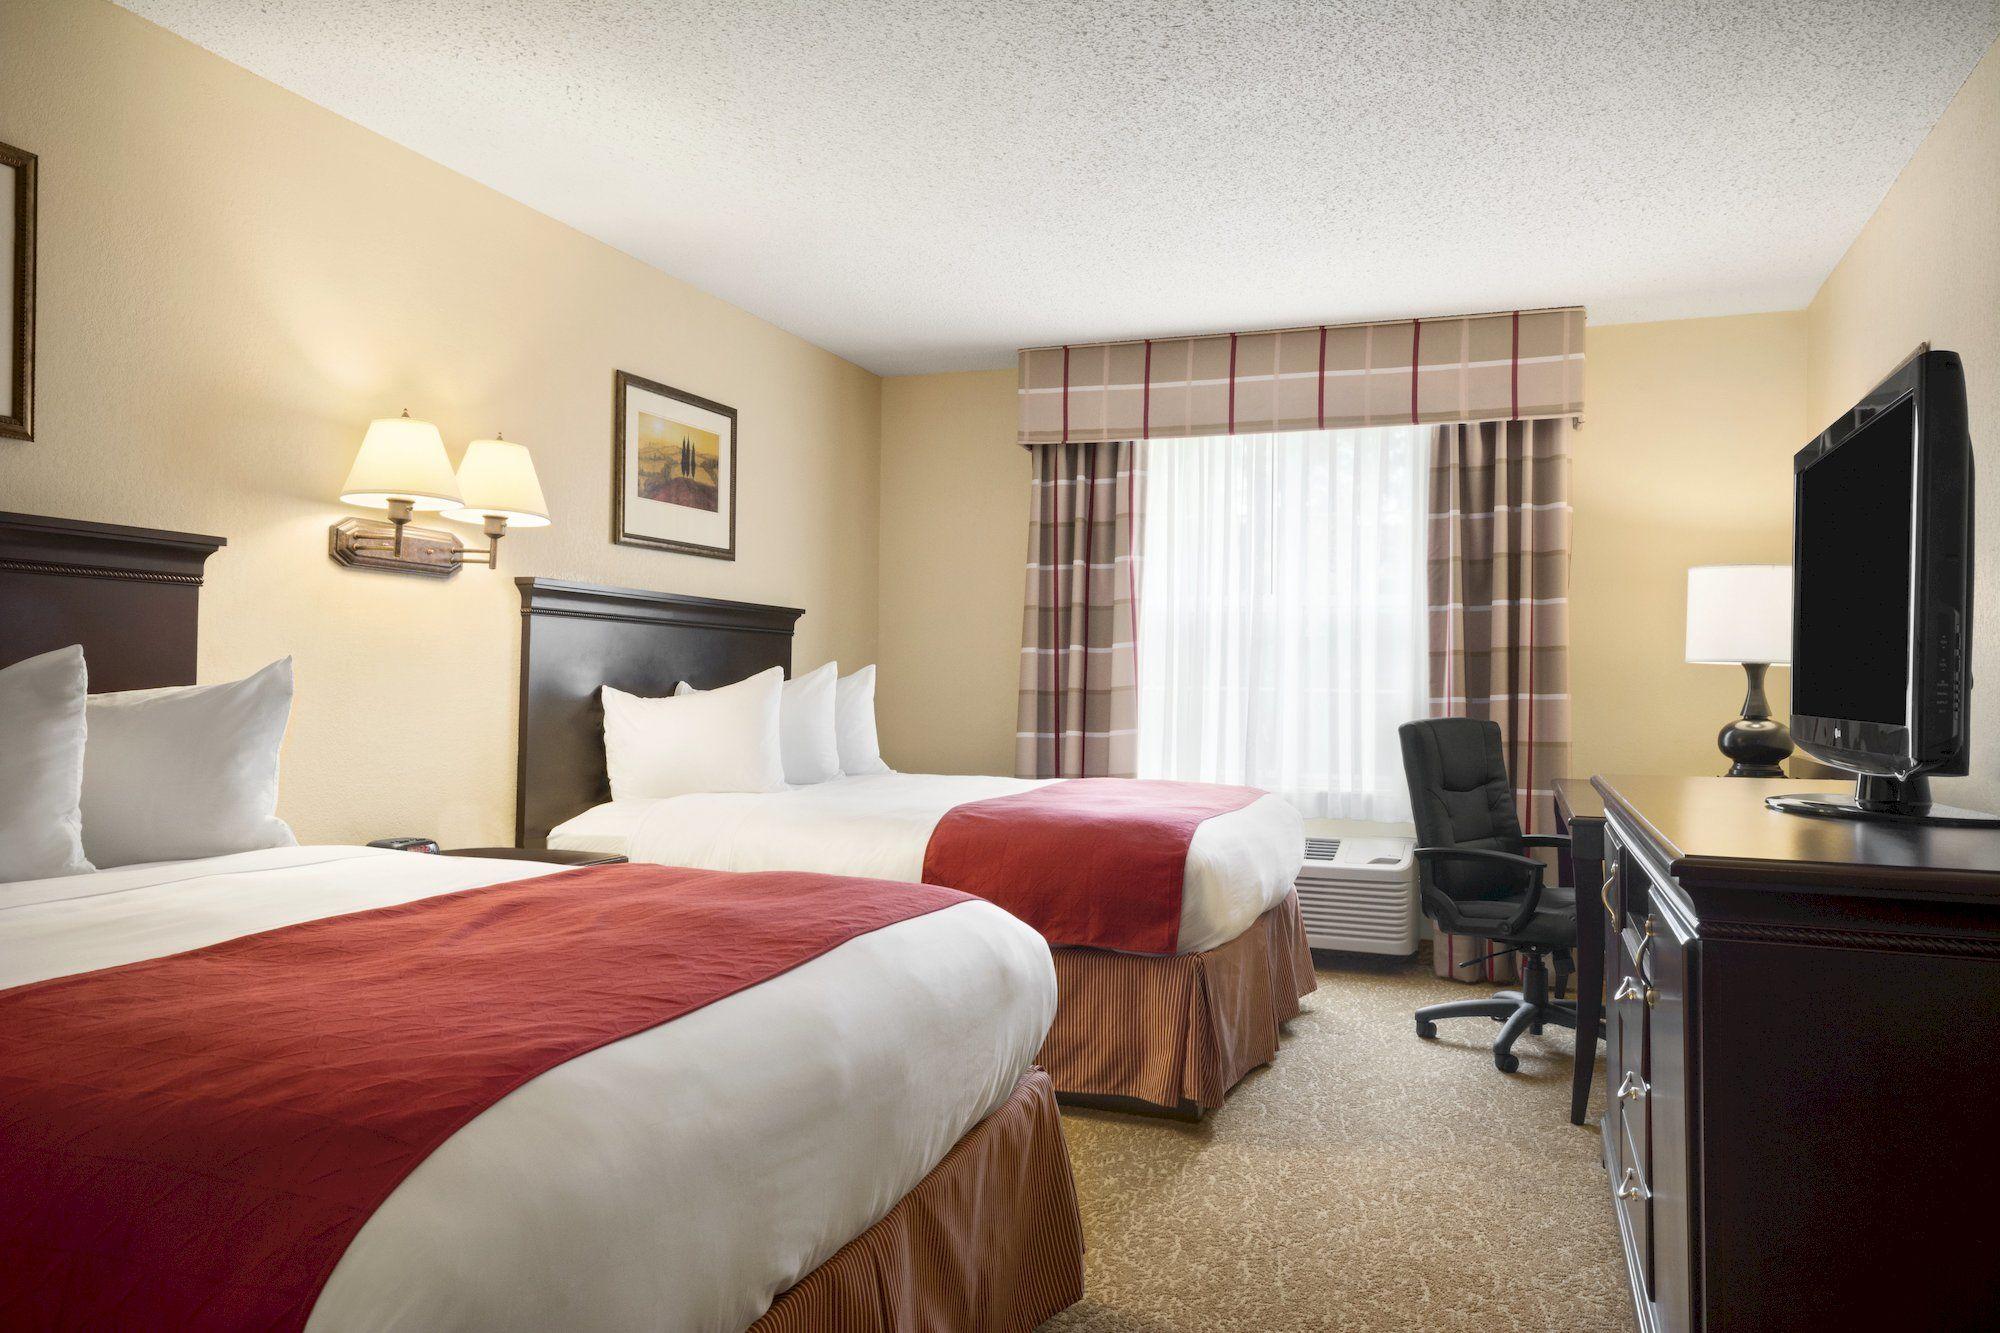 Country Inn & Suites Norcross in Norcross, GA